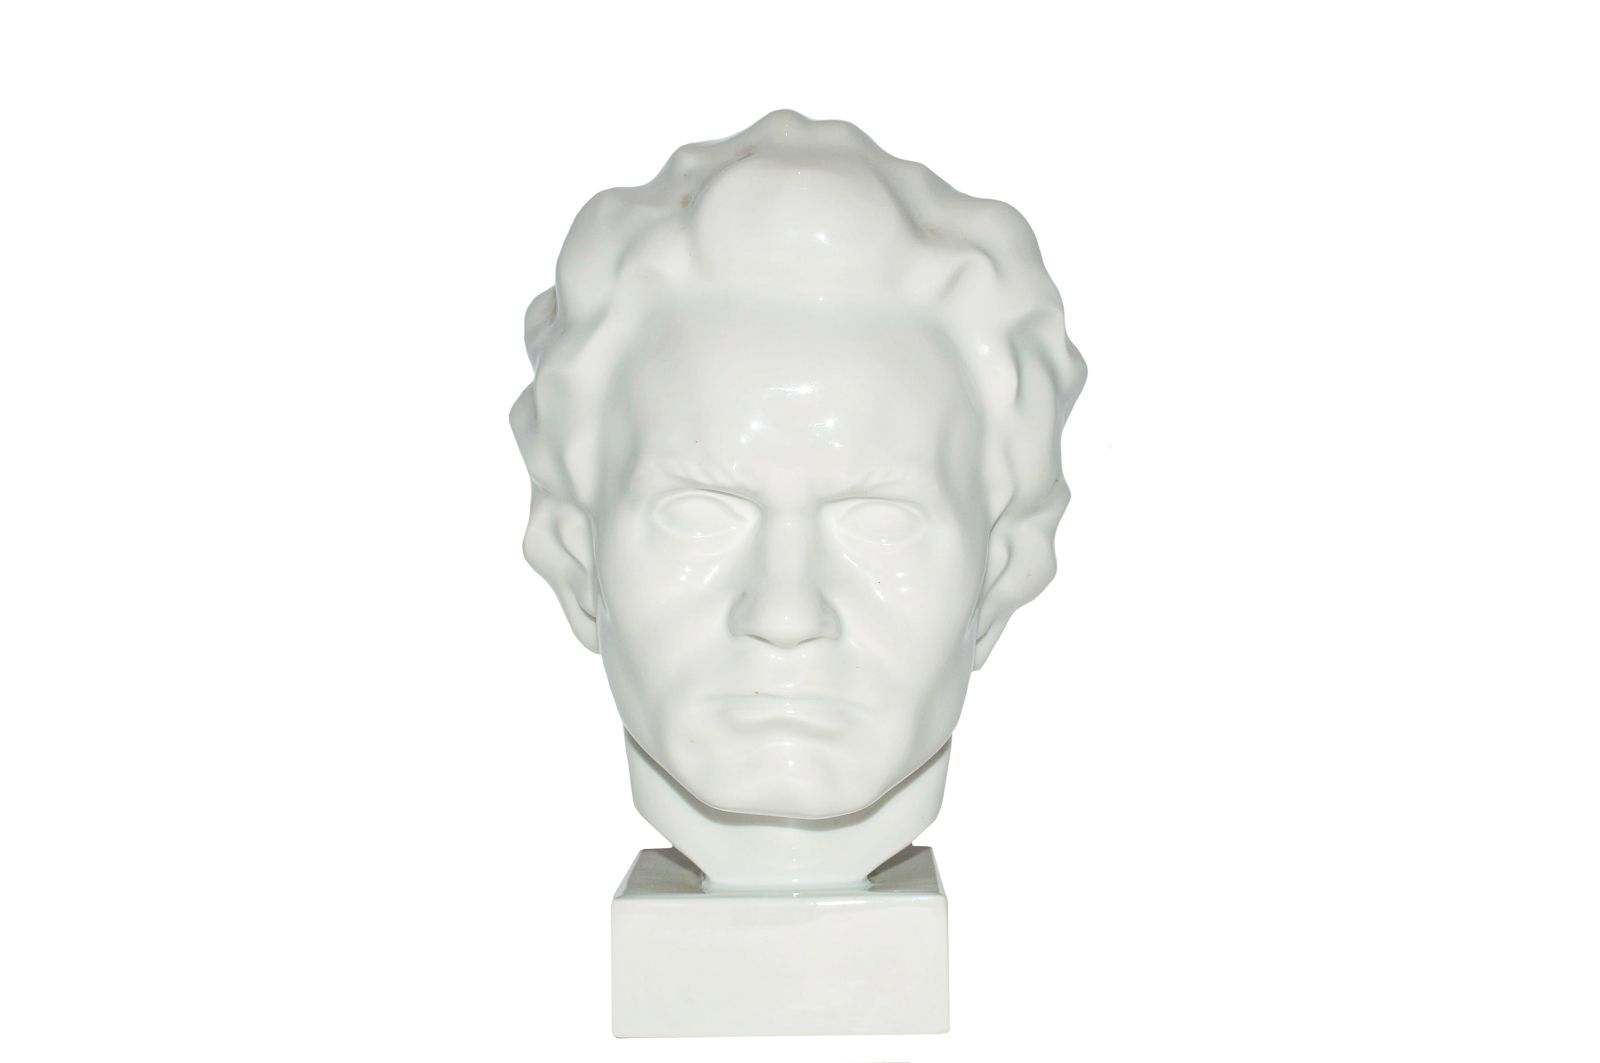 #208 Augarten bust Ludwig van Beethoven | Augarten Büste Ludwig van Beethoven Image